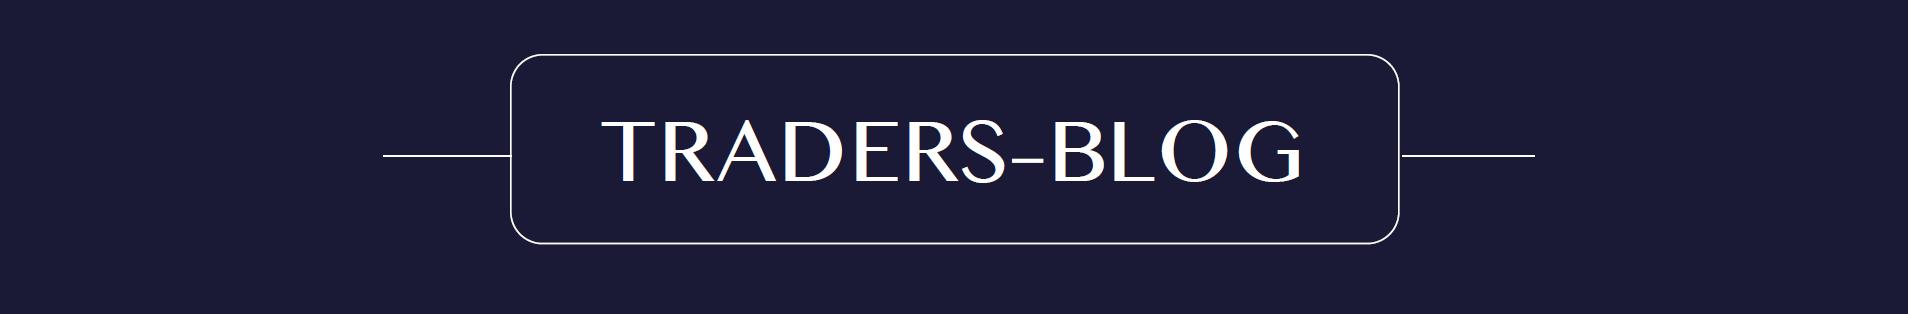 Traders Blog